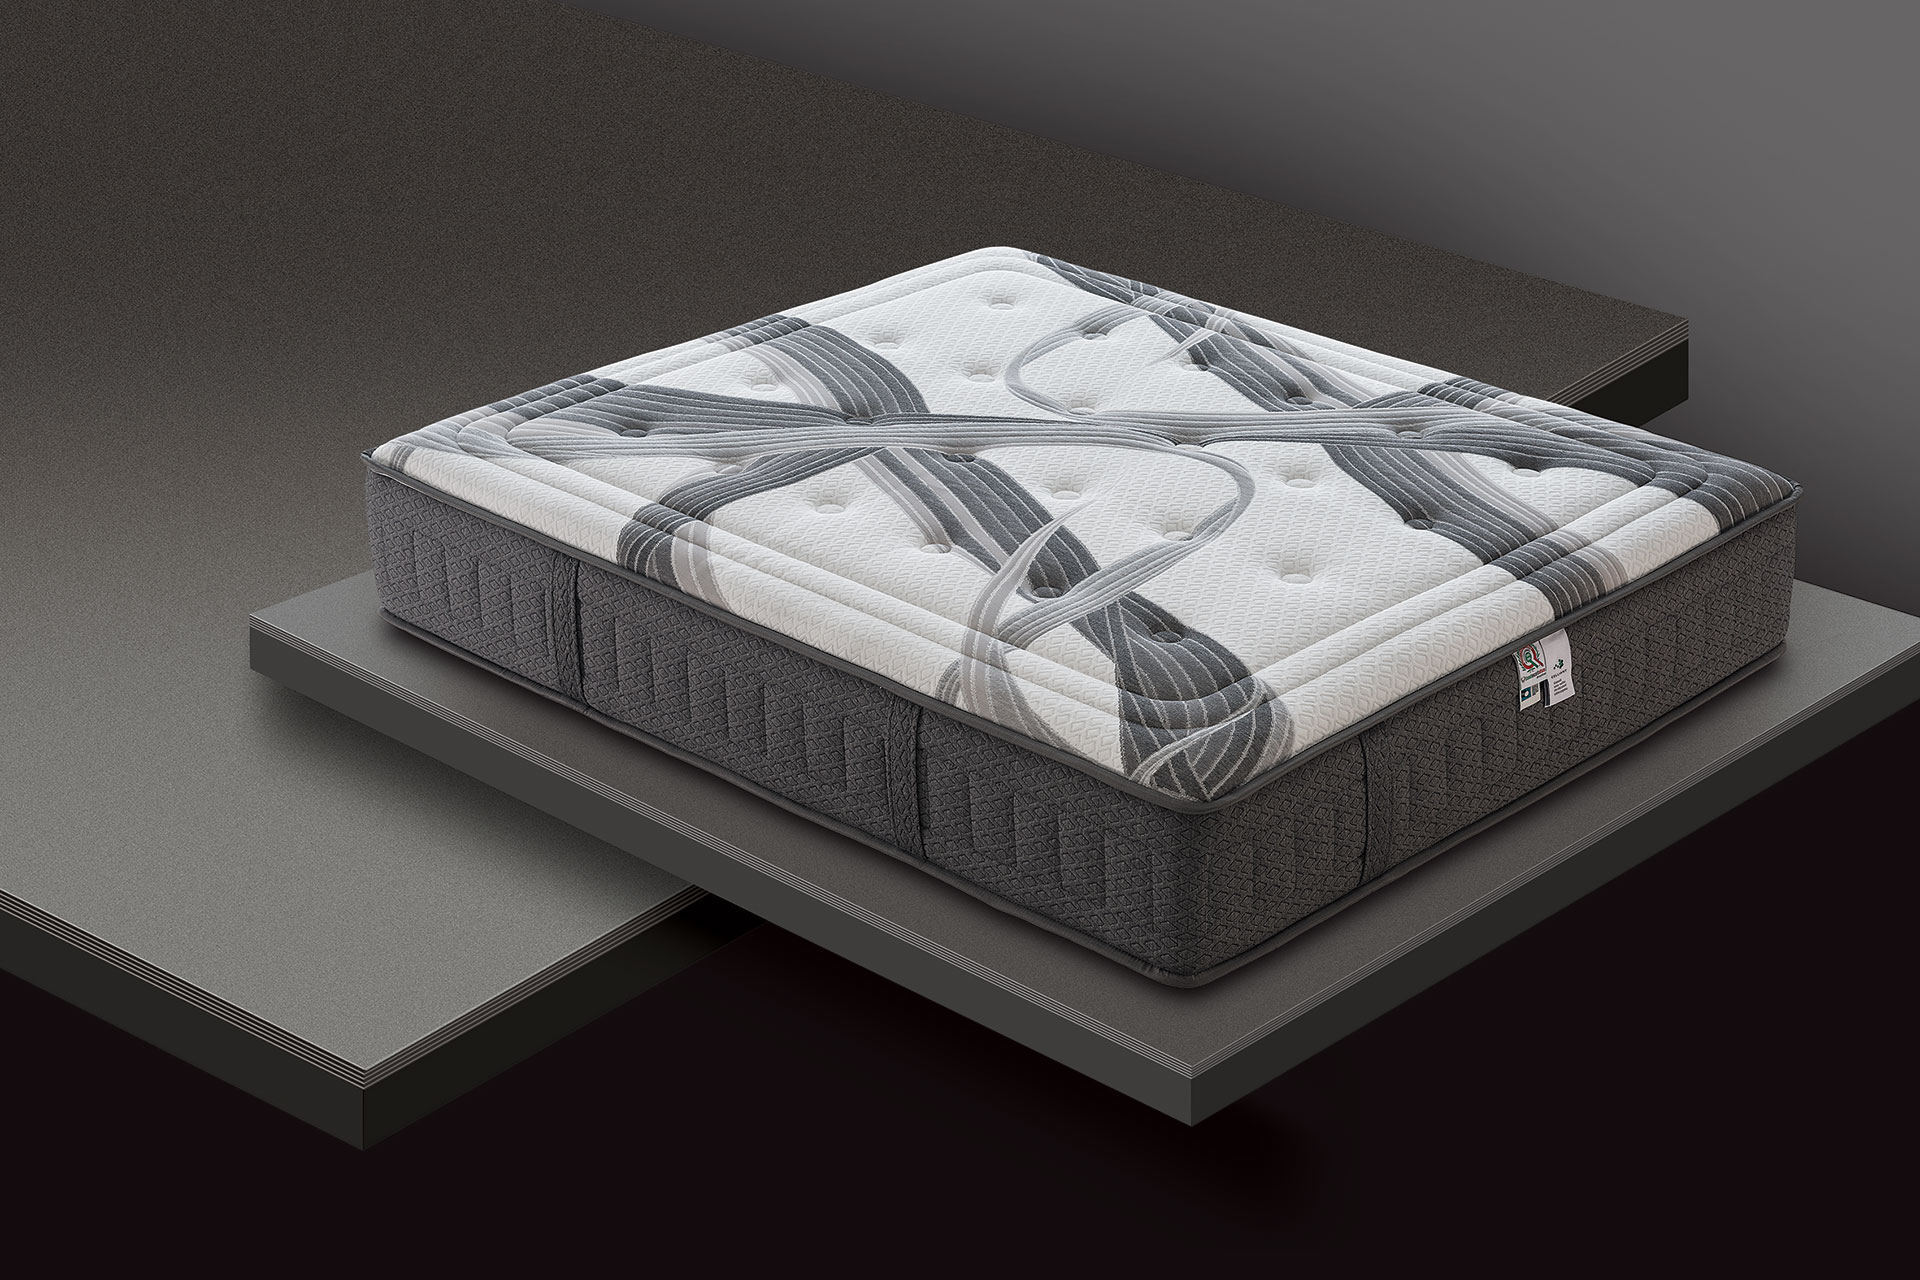 Materassi omniaflex dormire bene 0828 354664 for Materassi eminflex offerte